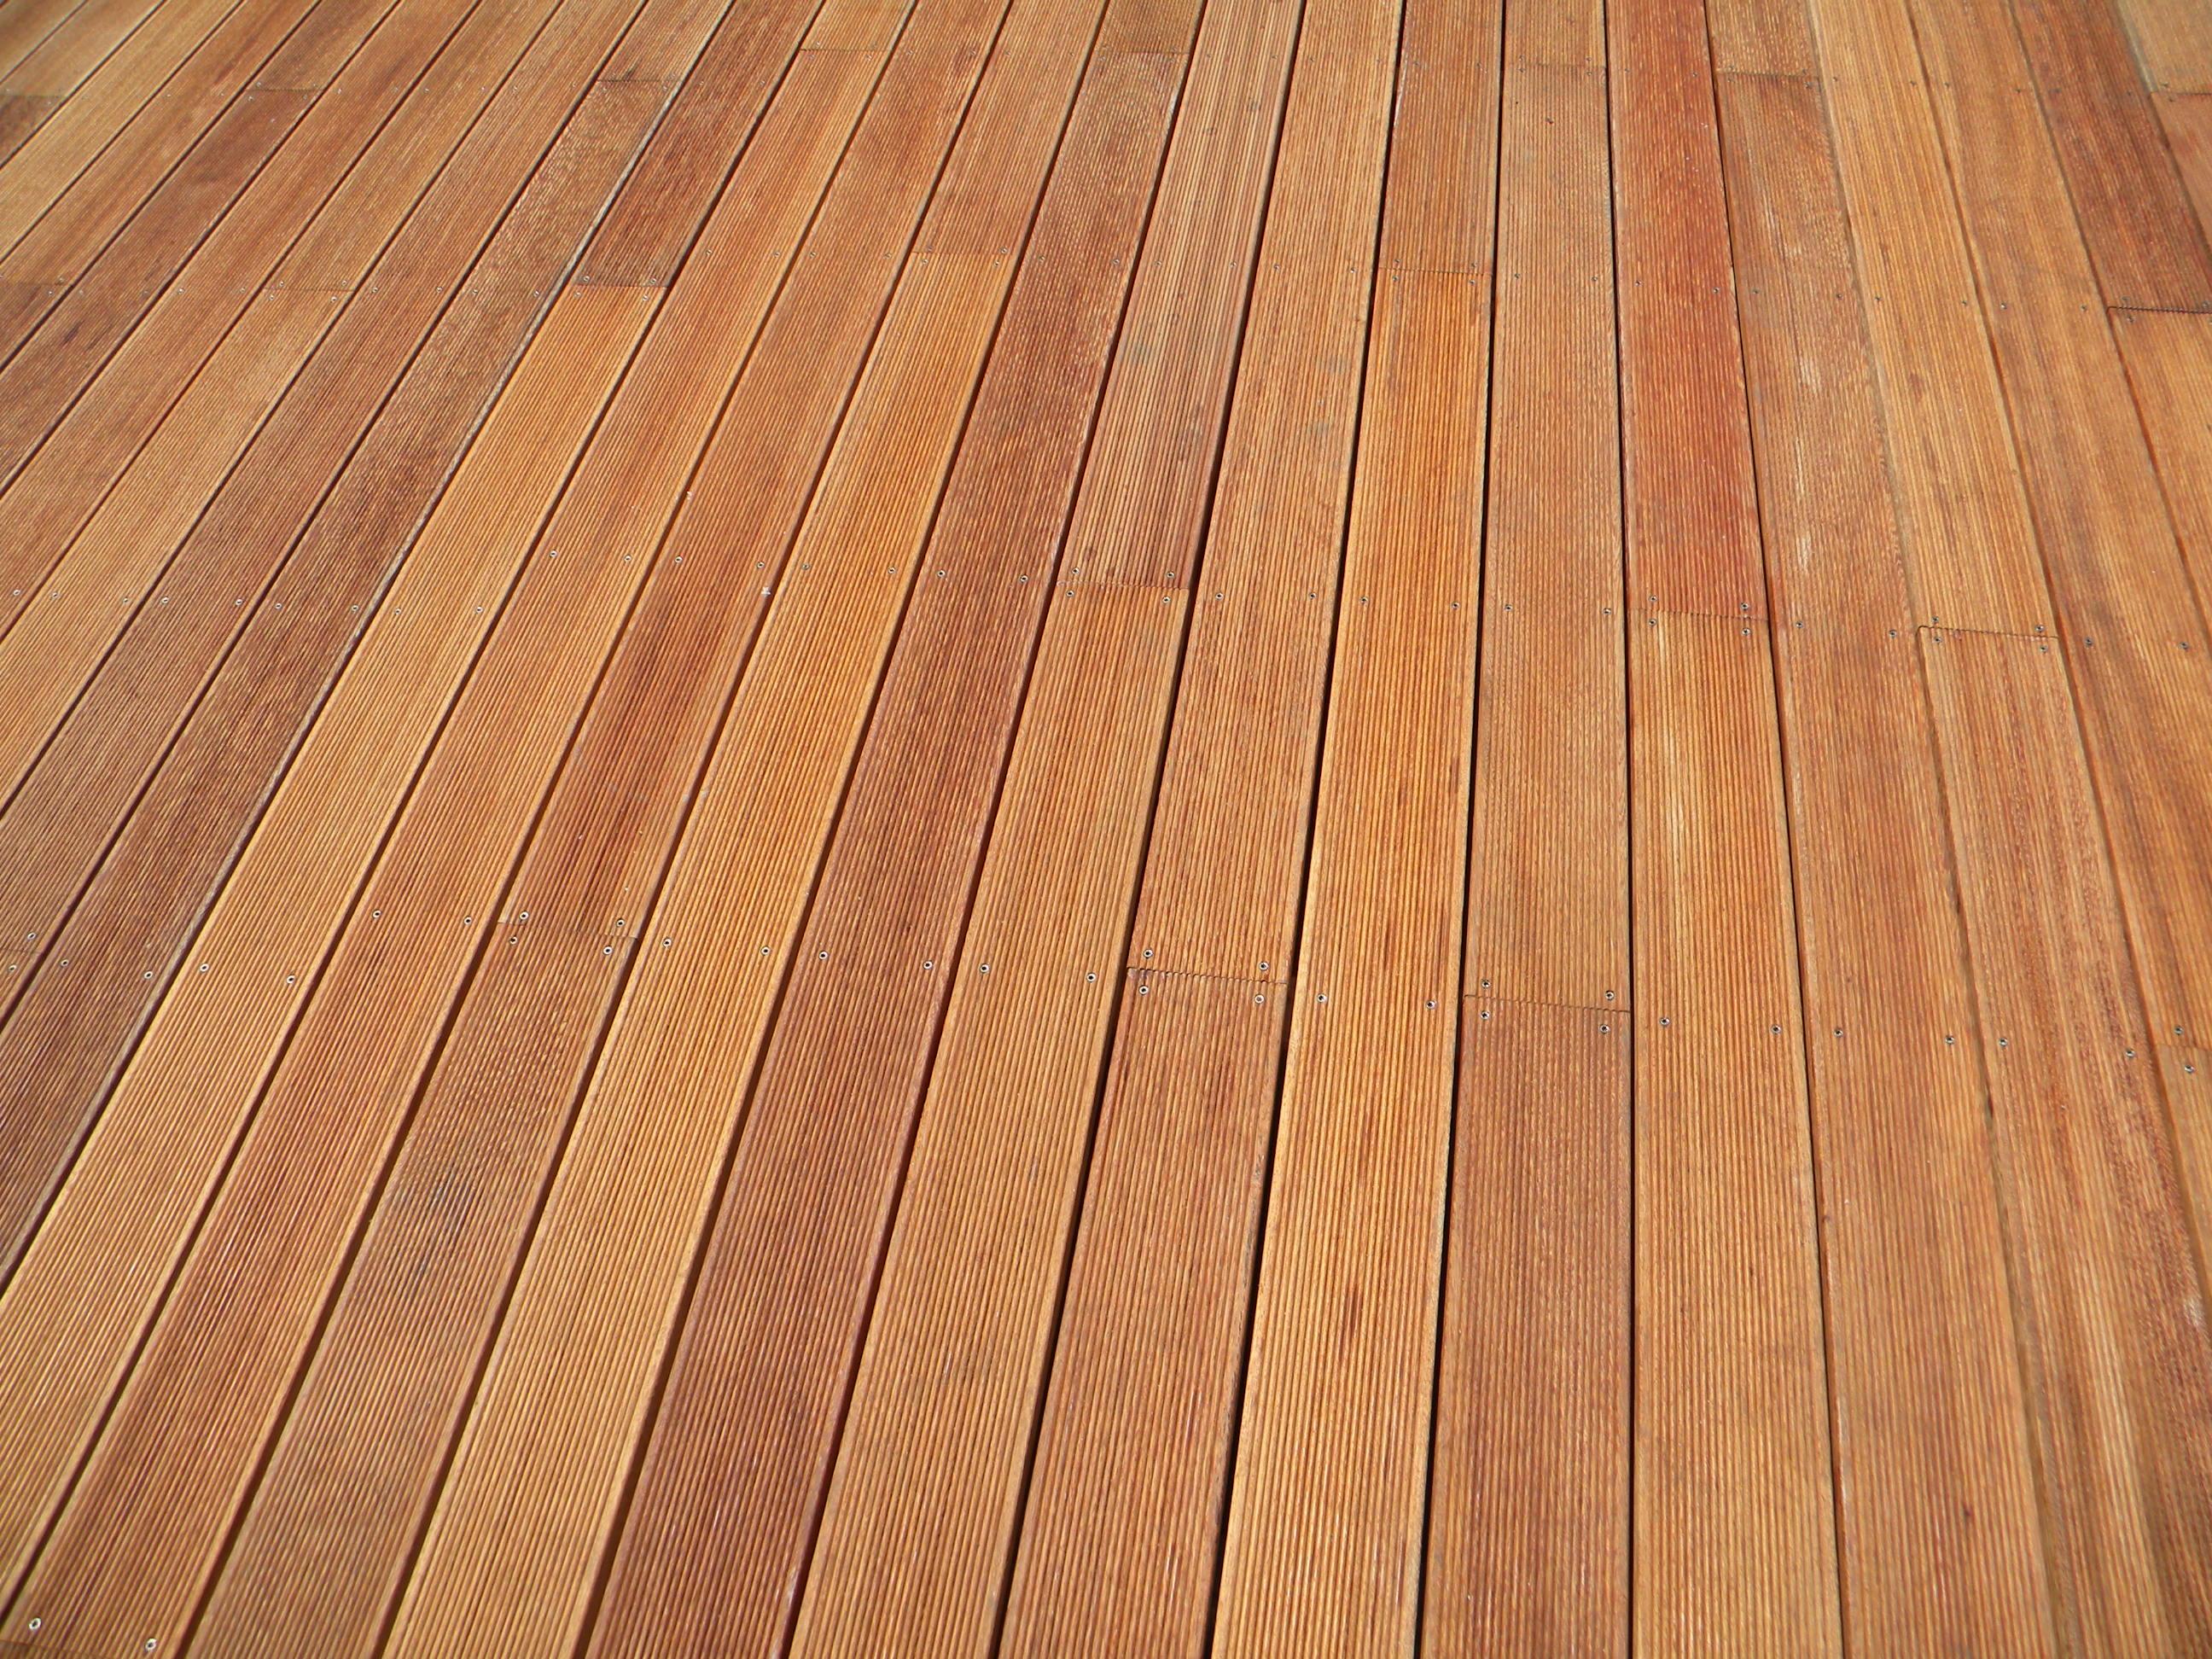 Deck-uri lemn - Angelim Pedra SELVA FLOORS - Poza 55